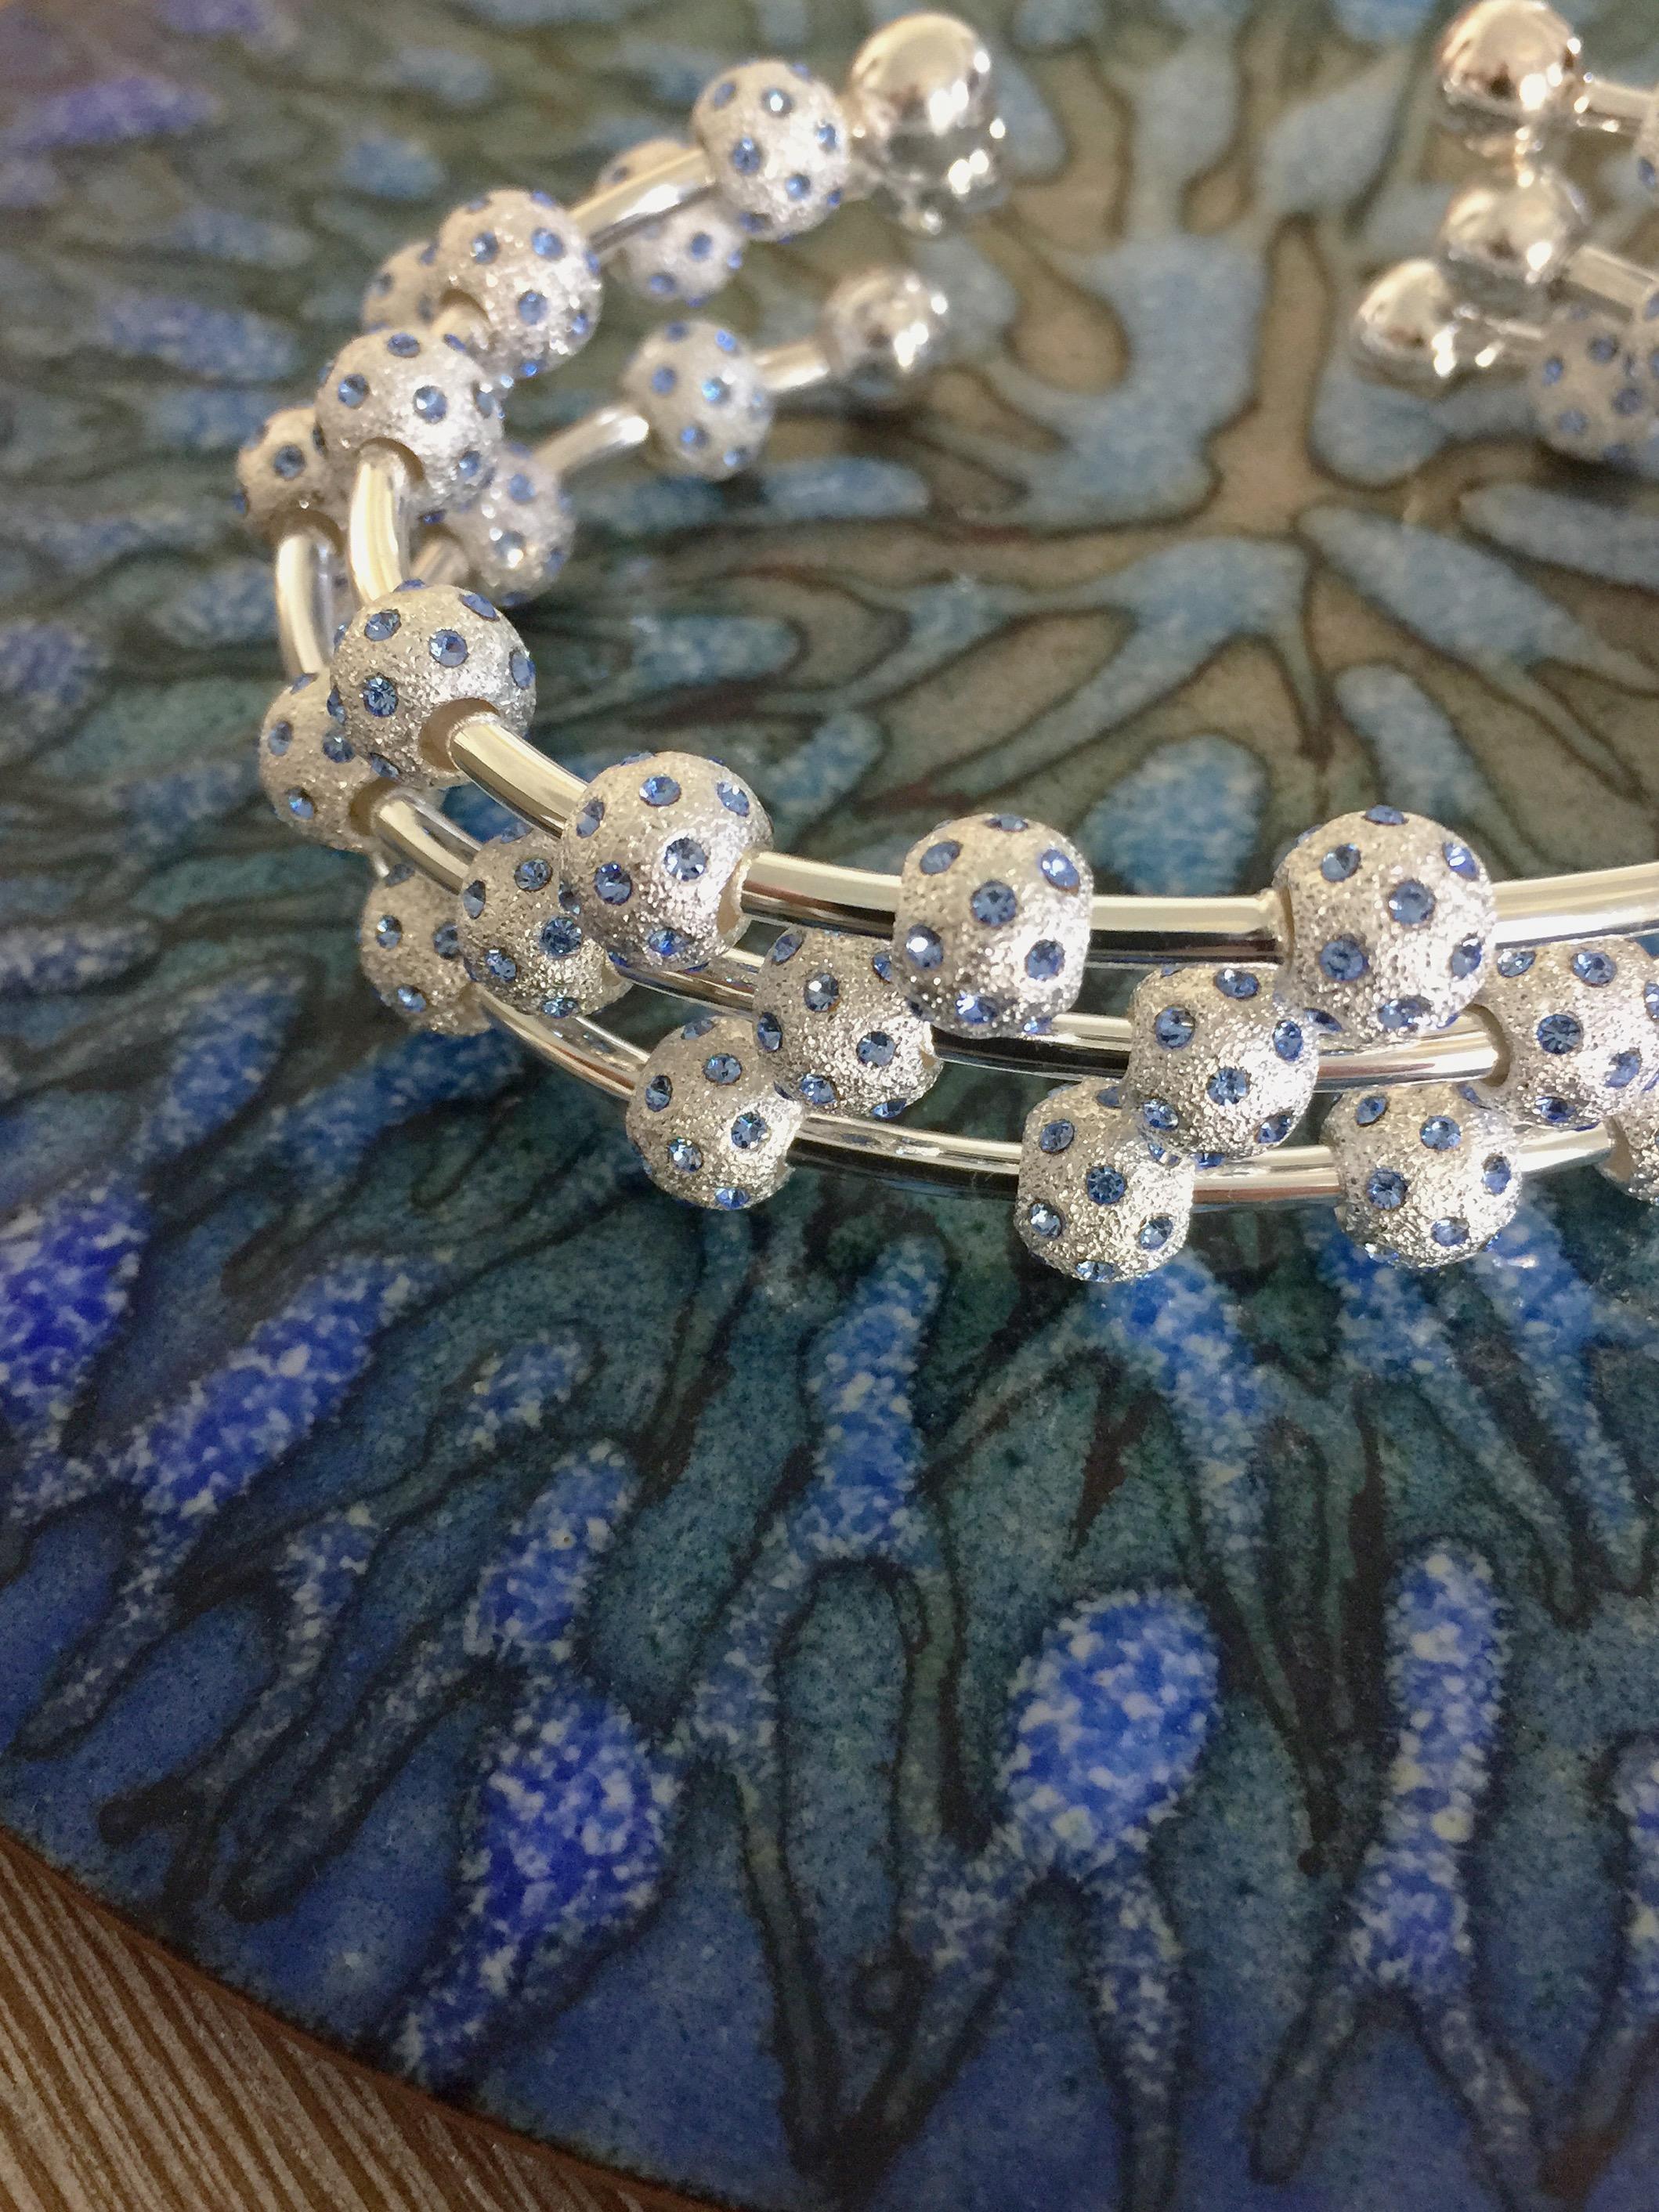 Pale Sapphire Count Me Healthy Watercolor Crystal Bracelets